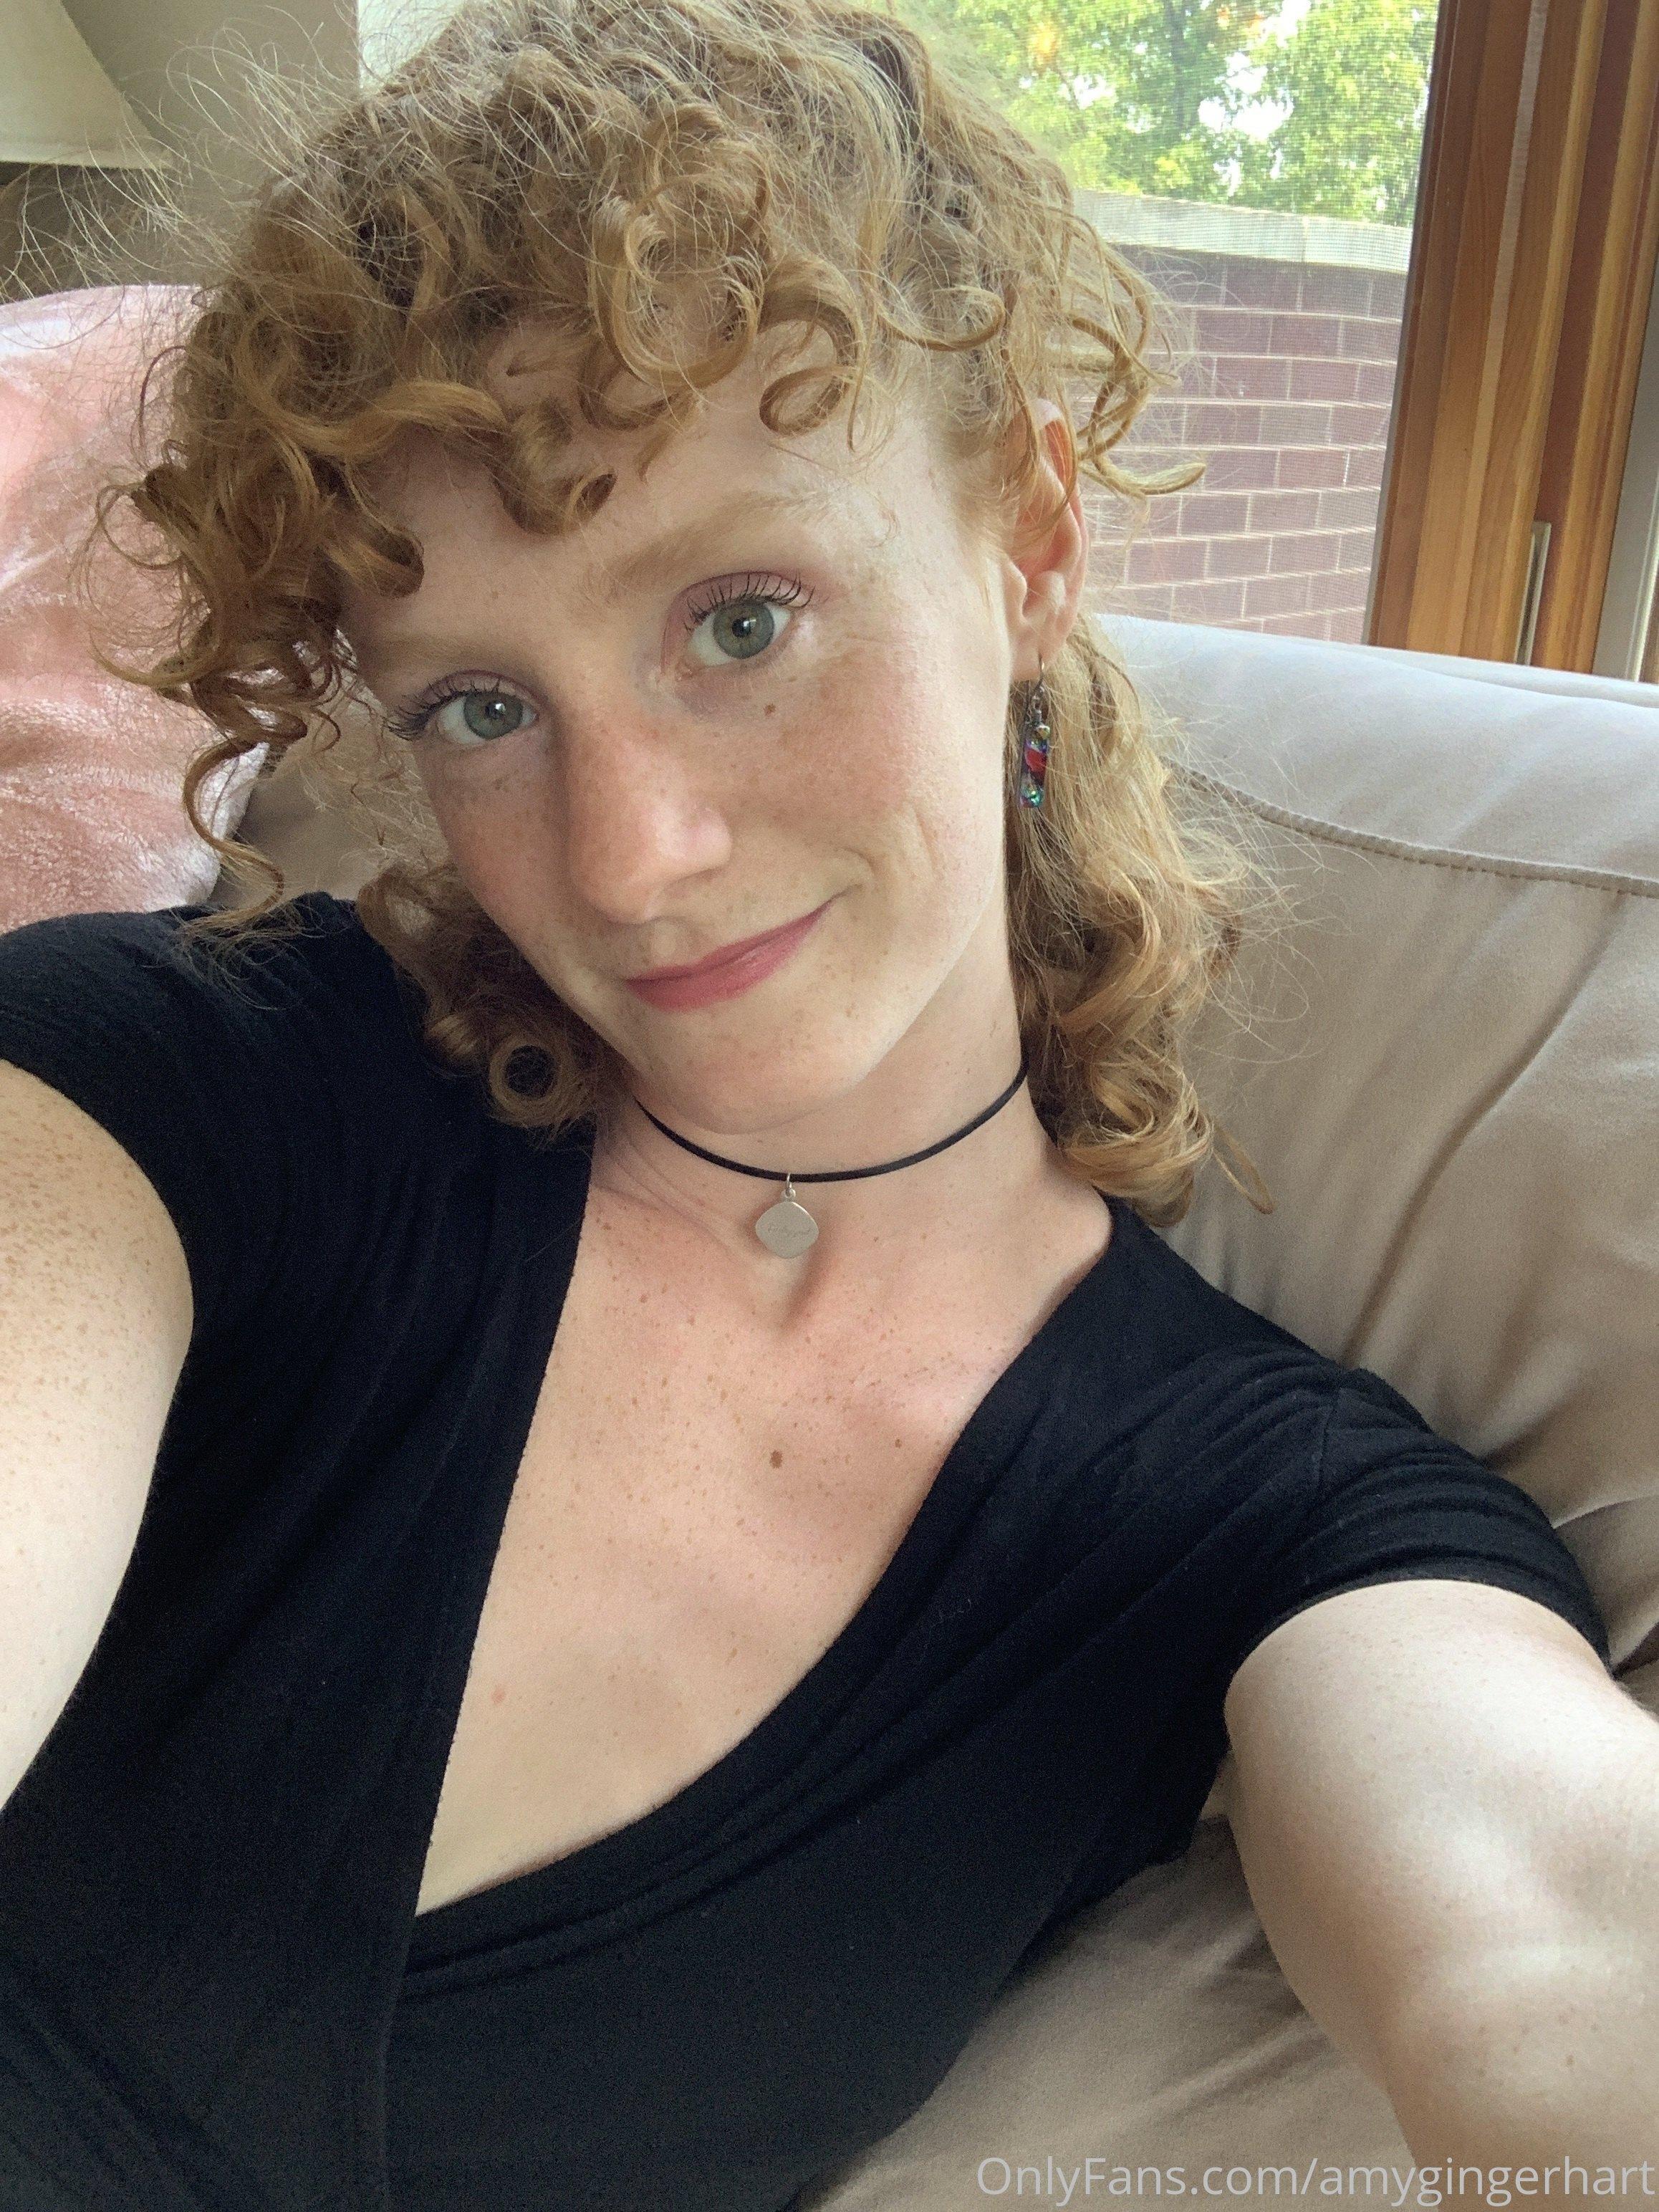 Amy Hart, Amygingerhart, Onlyfans 0102